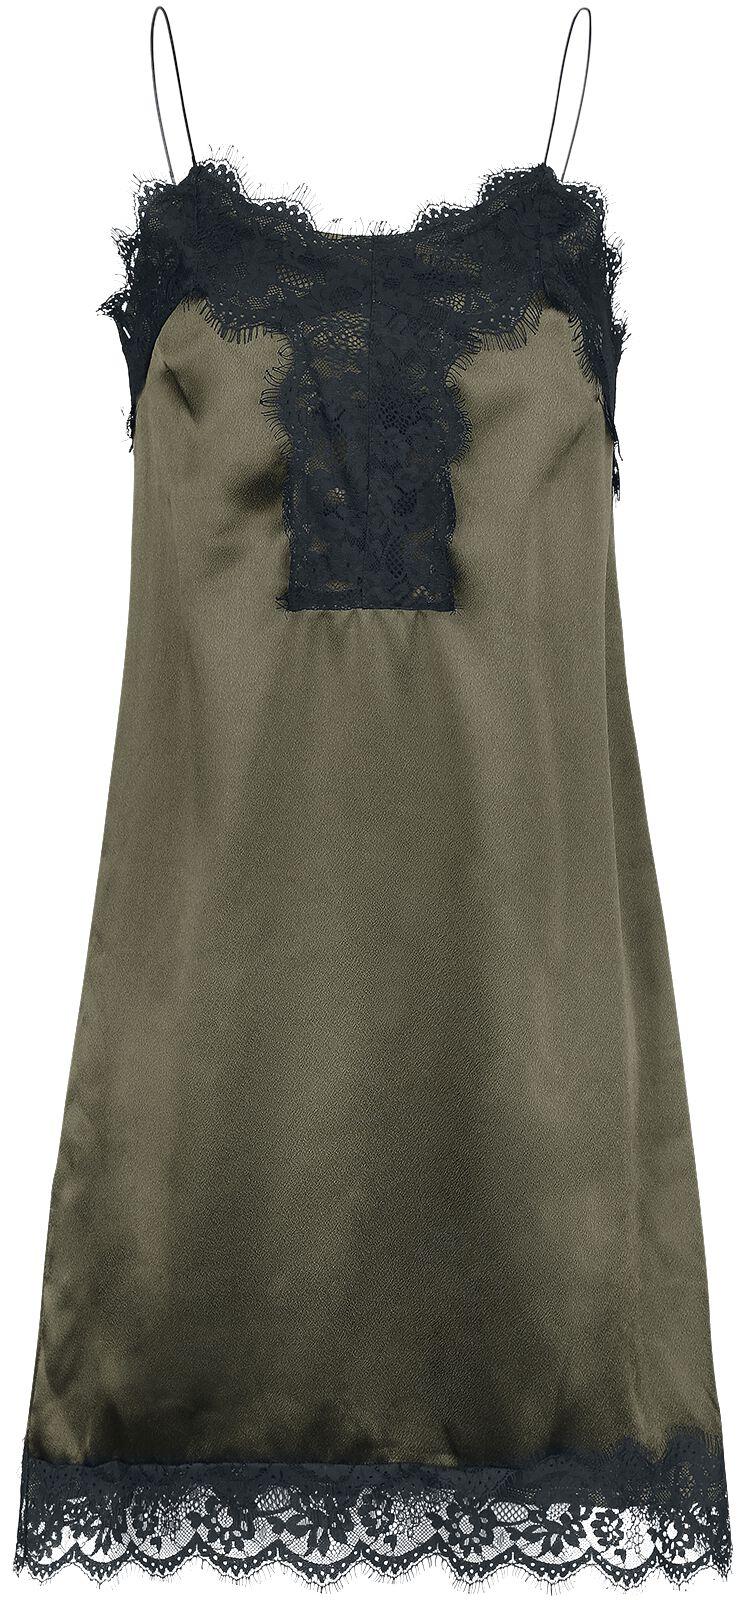 Image of   Fashion Victim Camisole Dress Kjole olivengrøn